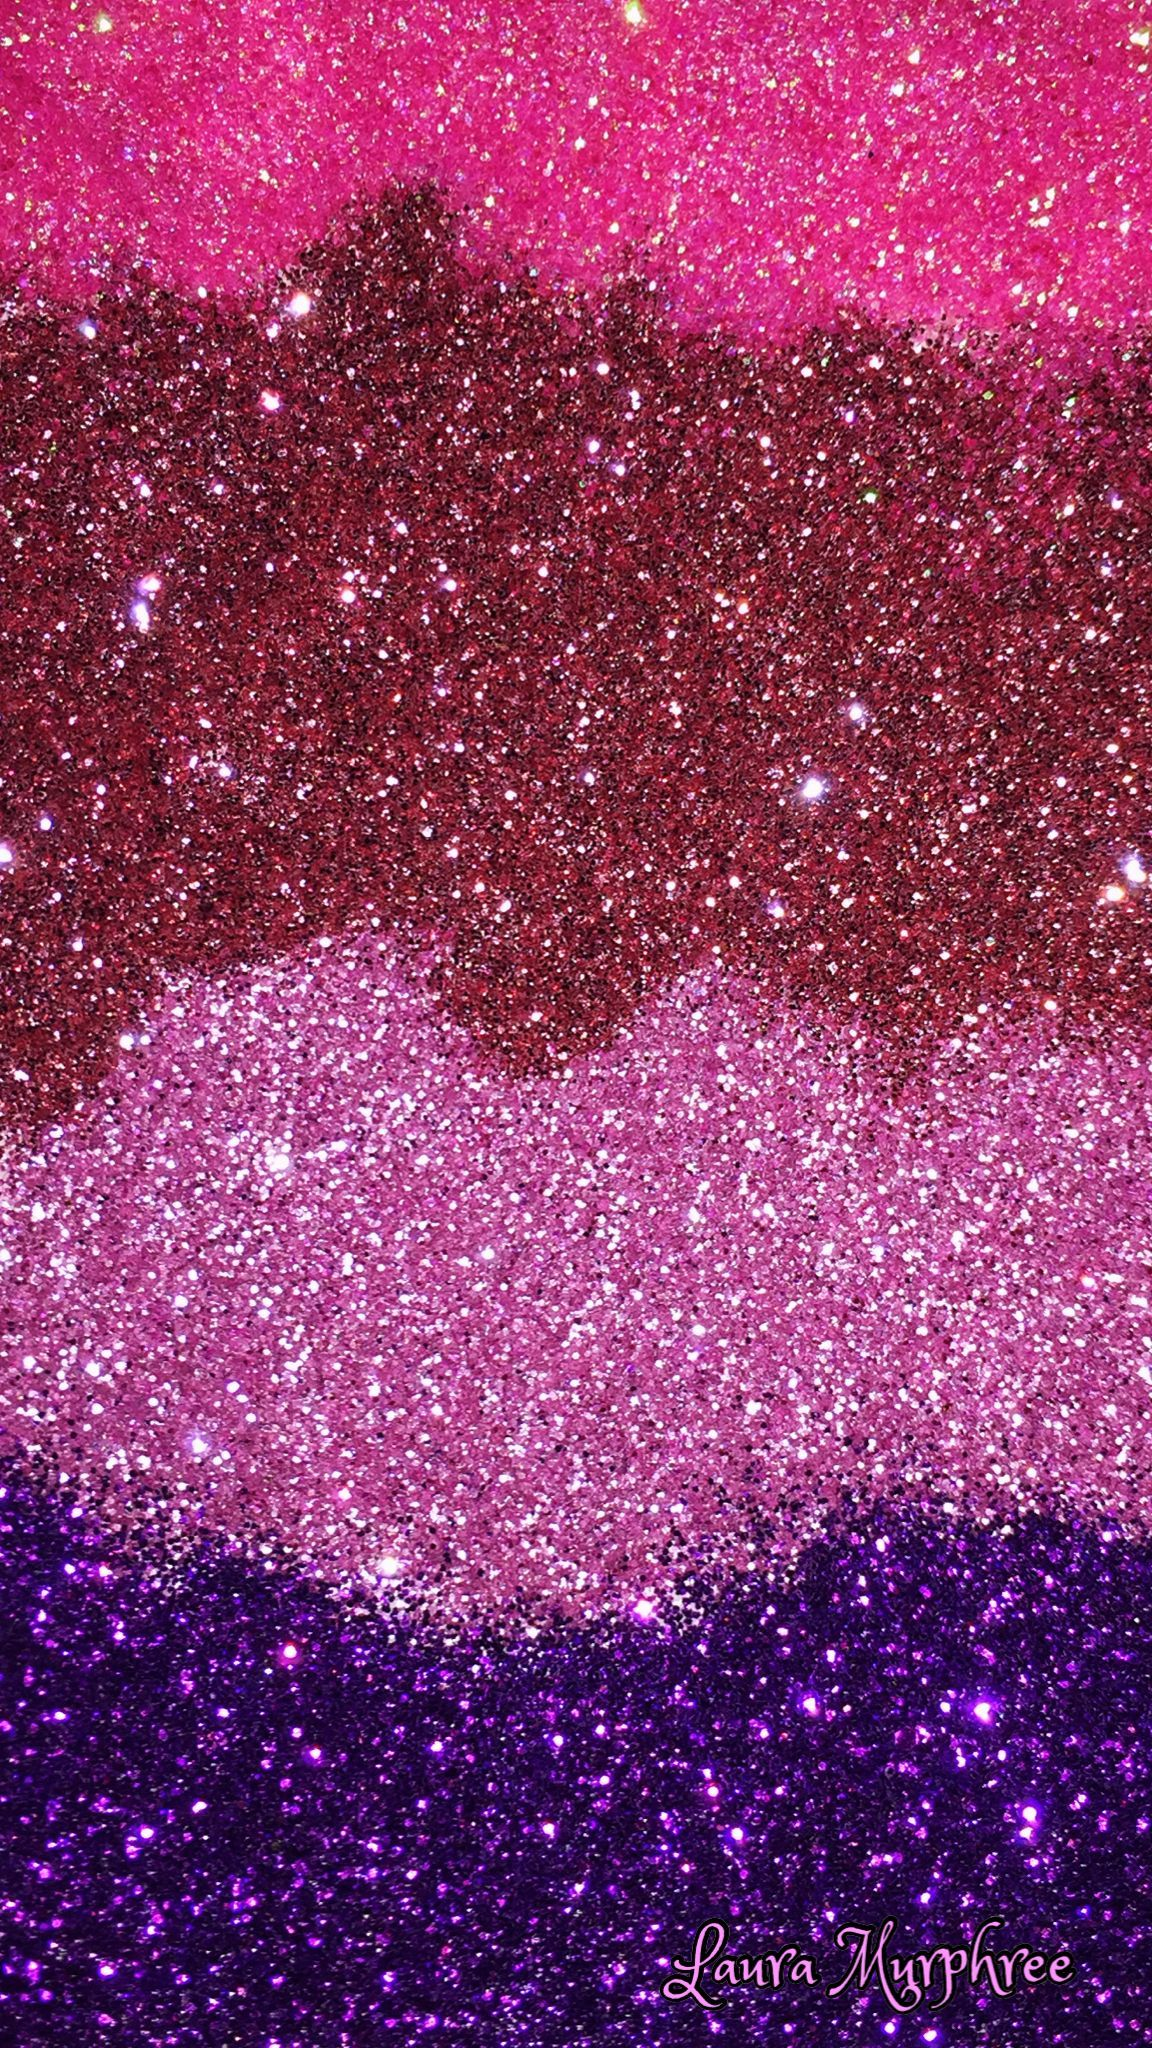 Glitter Phone Wallpaper Colorful Sparkle Background Pretty Girly Sparkling Pink Purple Glitter G Sparkles Background Glitter Wallpaper Glitter Phone Wallpaper